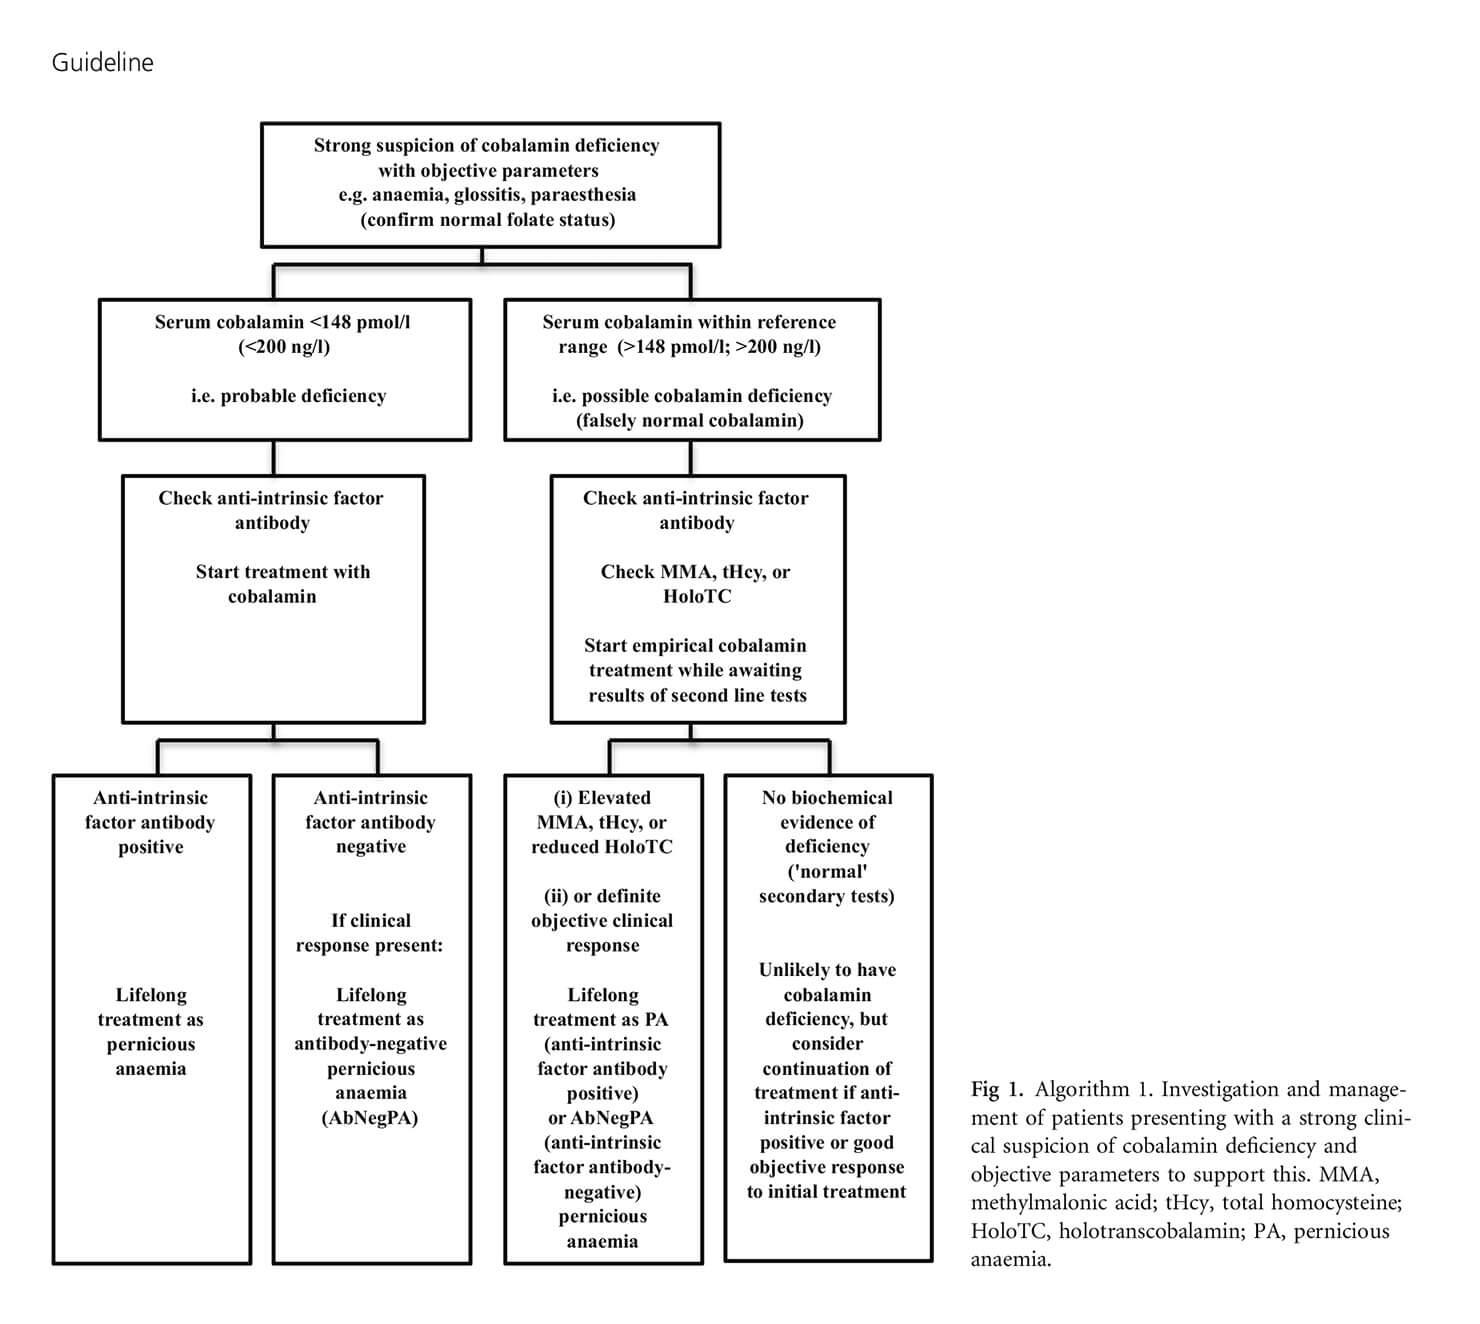 BSH guideline